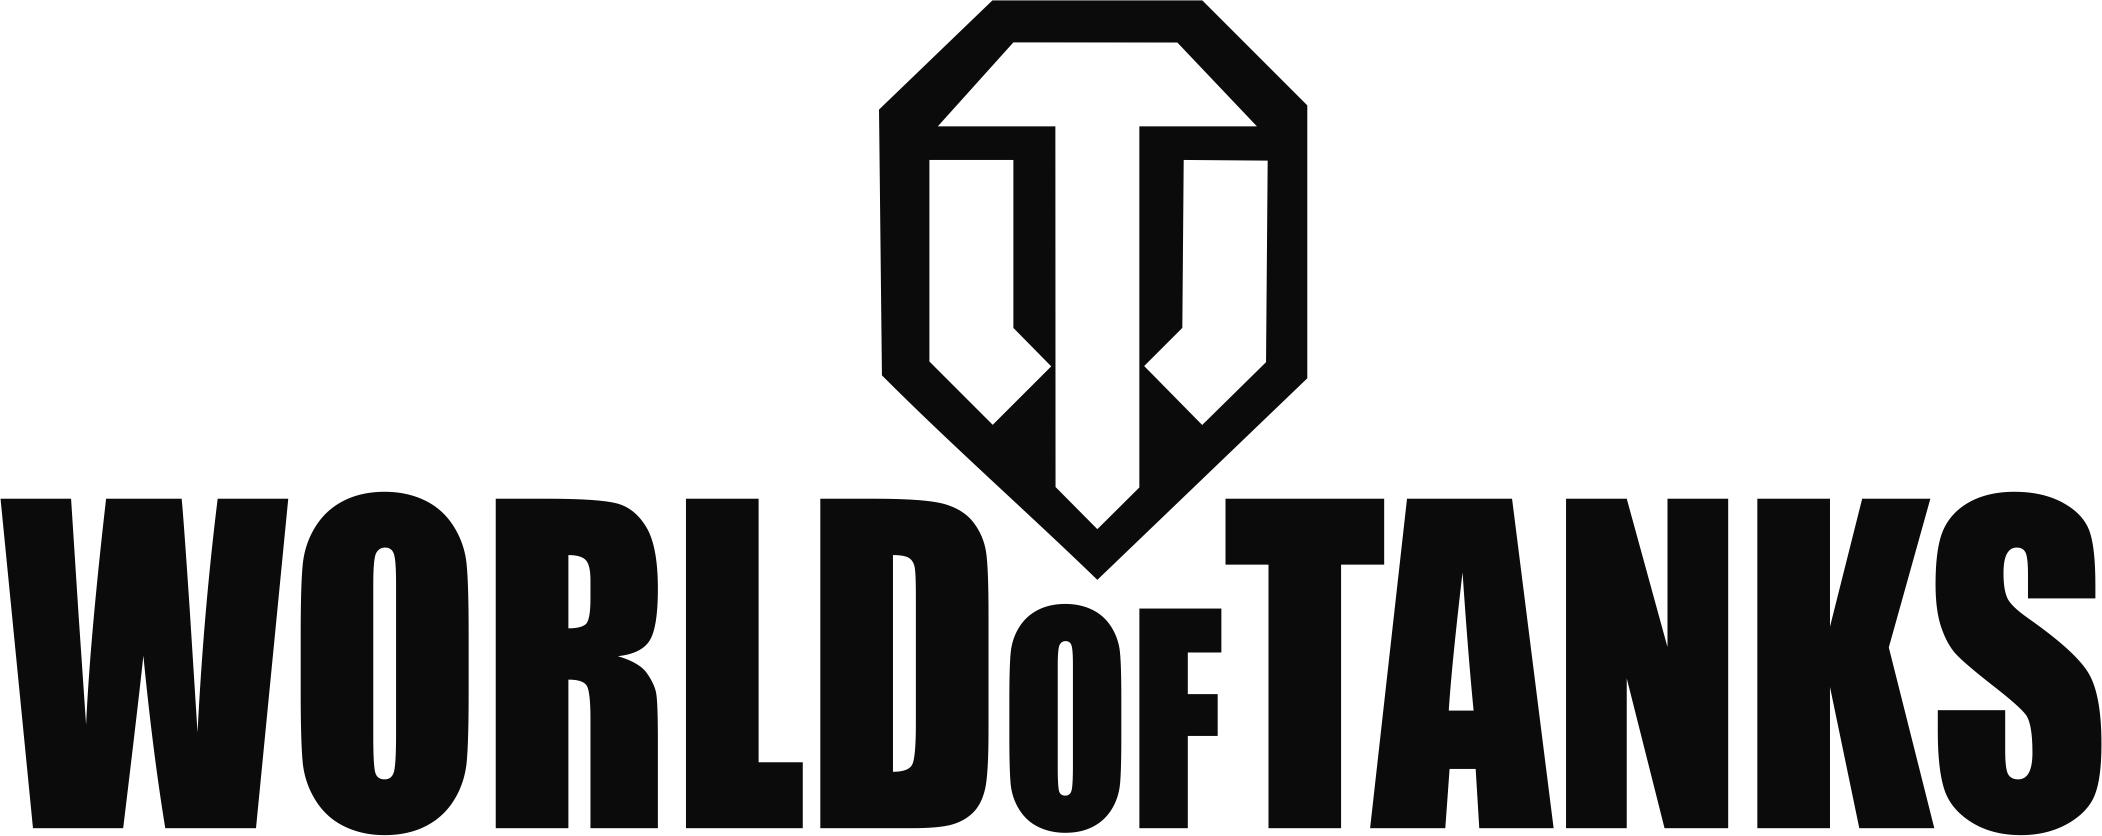 World Of Tanks Logo File Free CDR Vectors Art